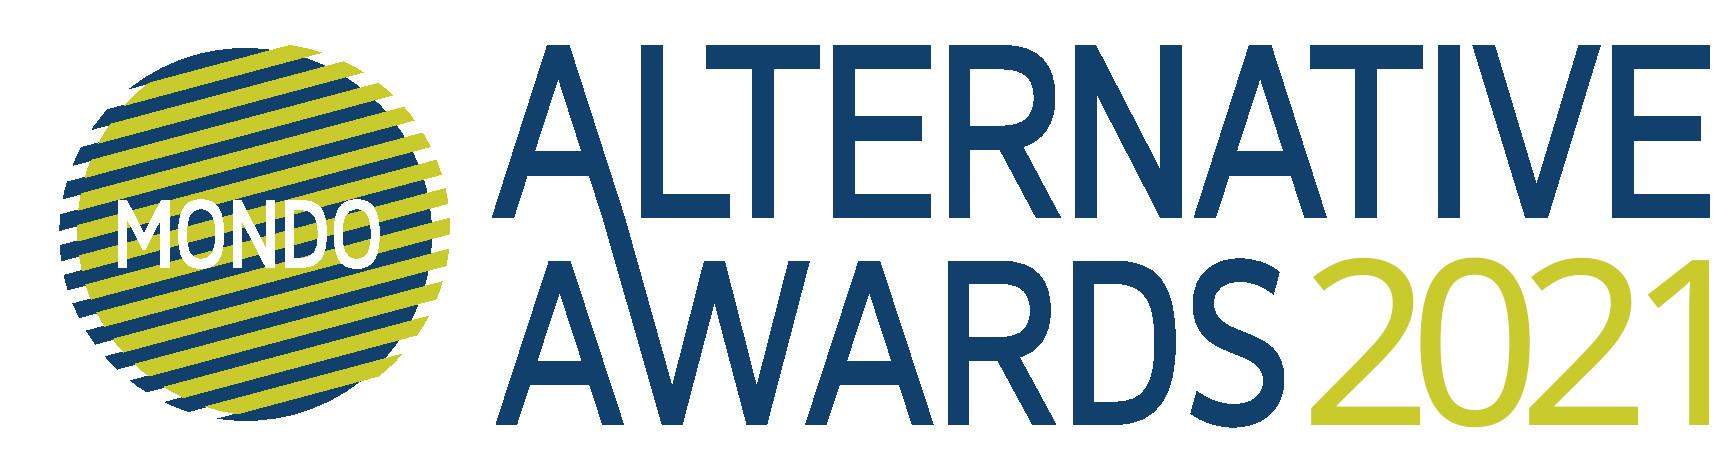 Mondo Alternative Awards 2021